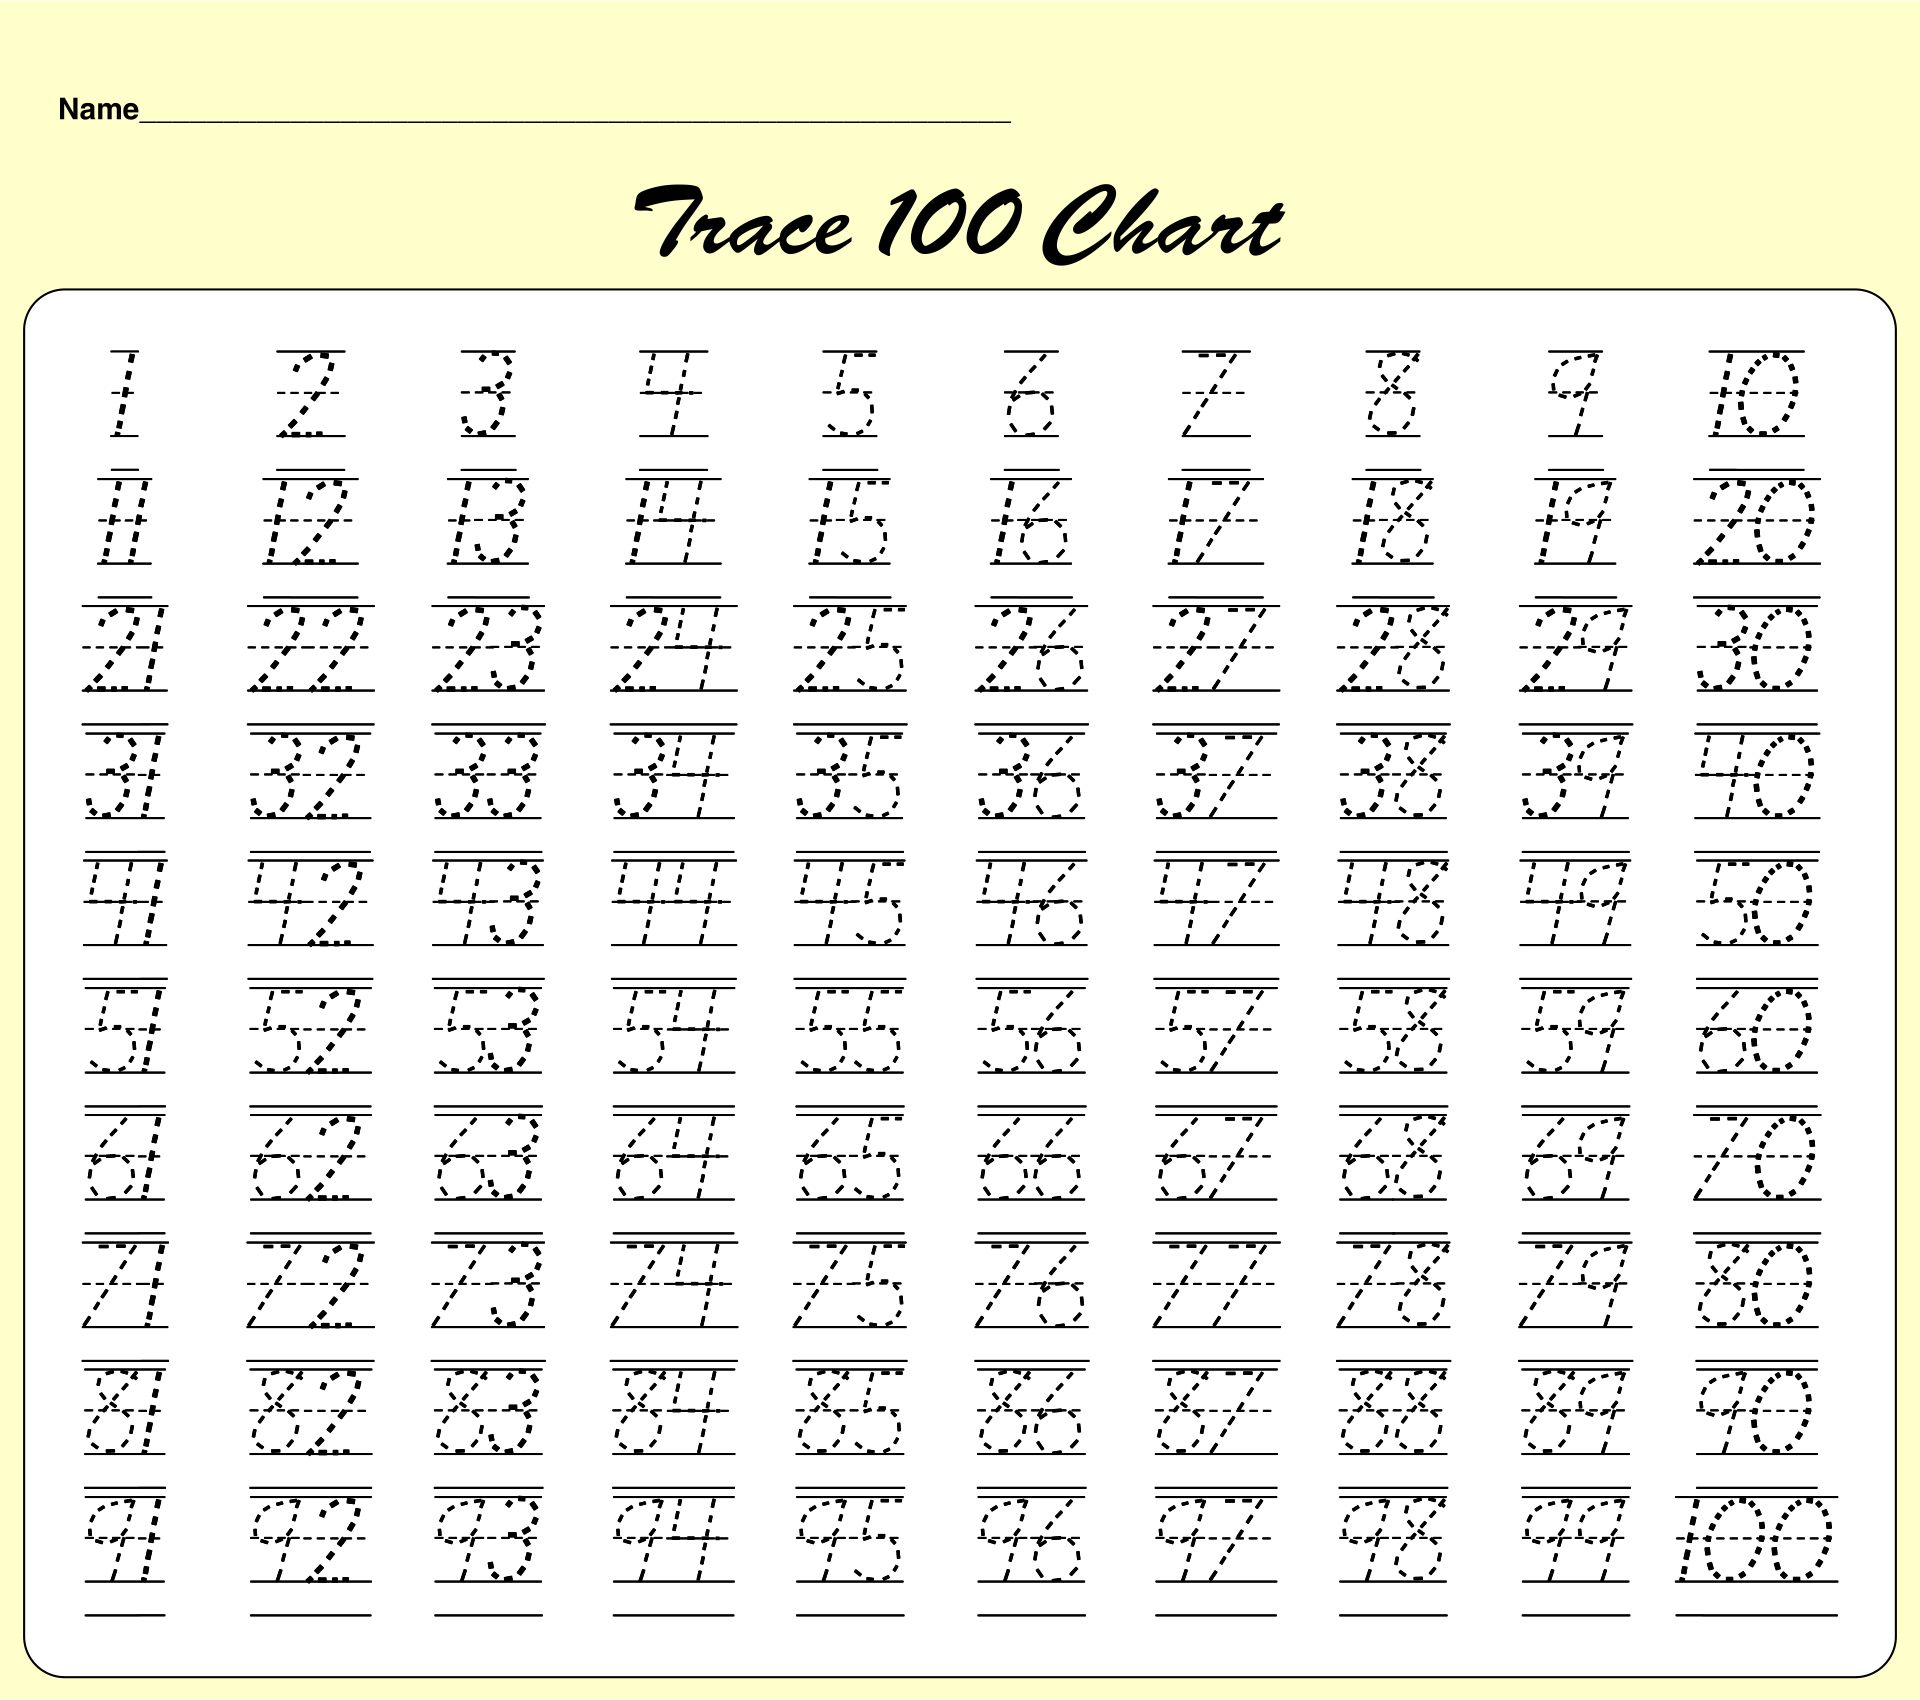 Trace 100 Chart